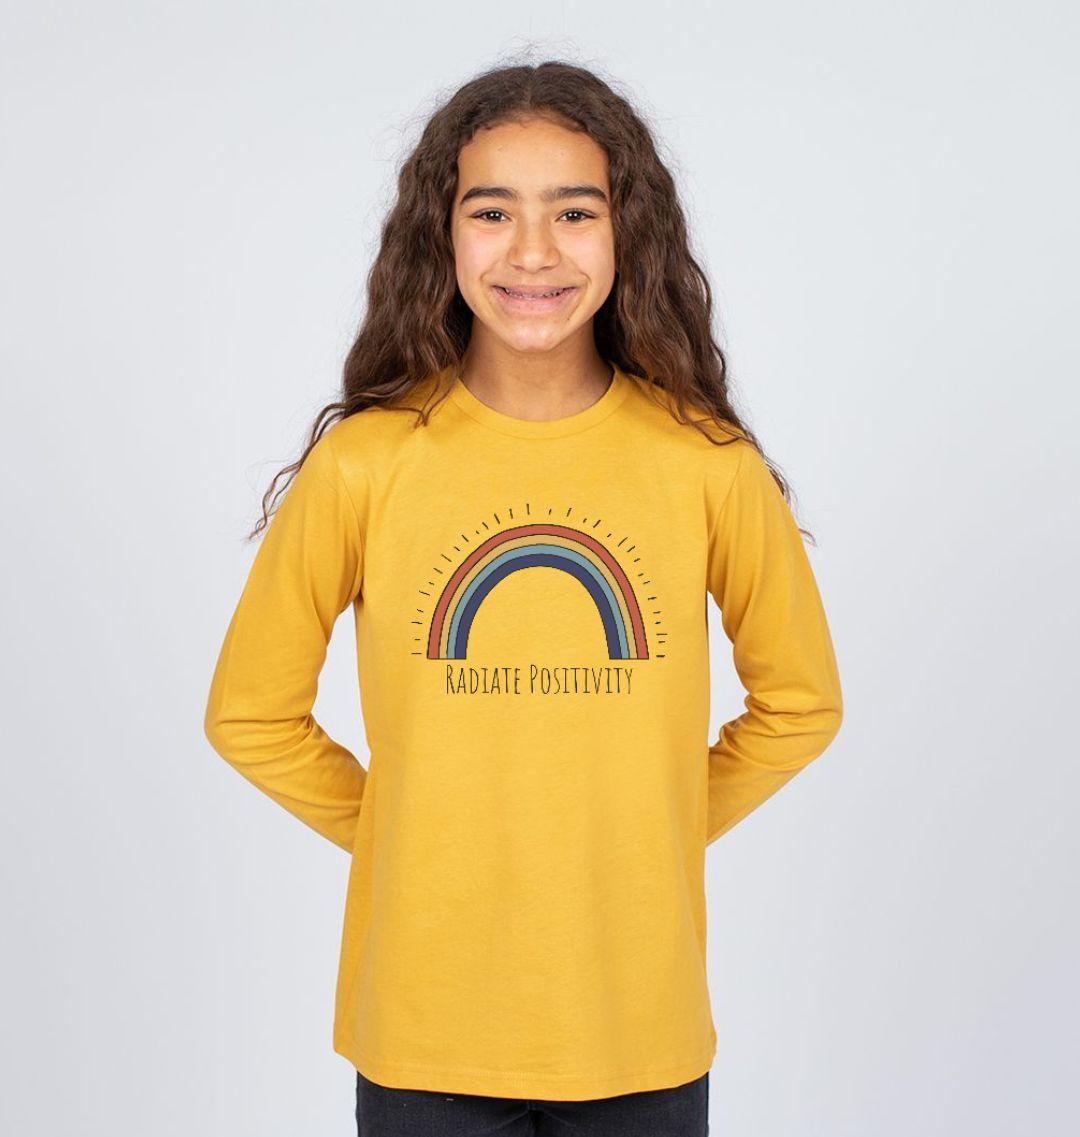 'Radiate Positivity' Rainbow Children's T Shirt - Soft Organic Cotton yellow